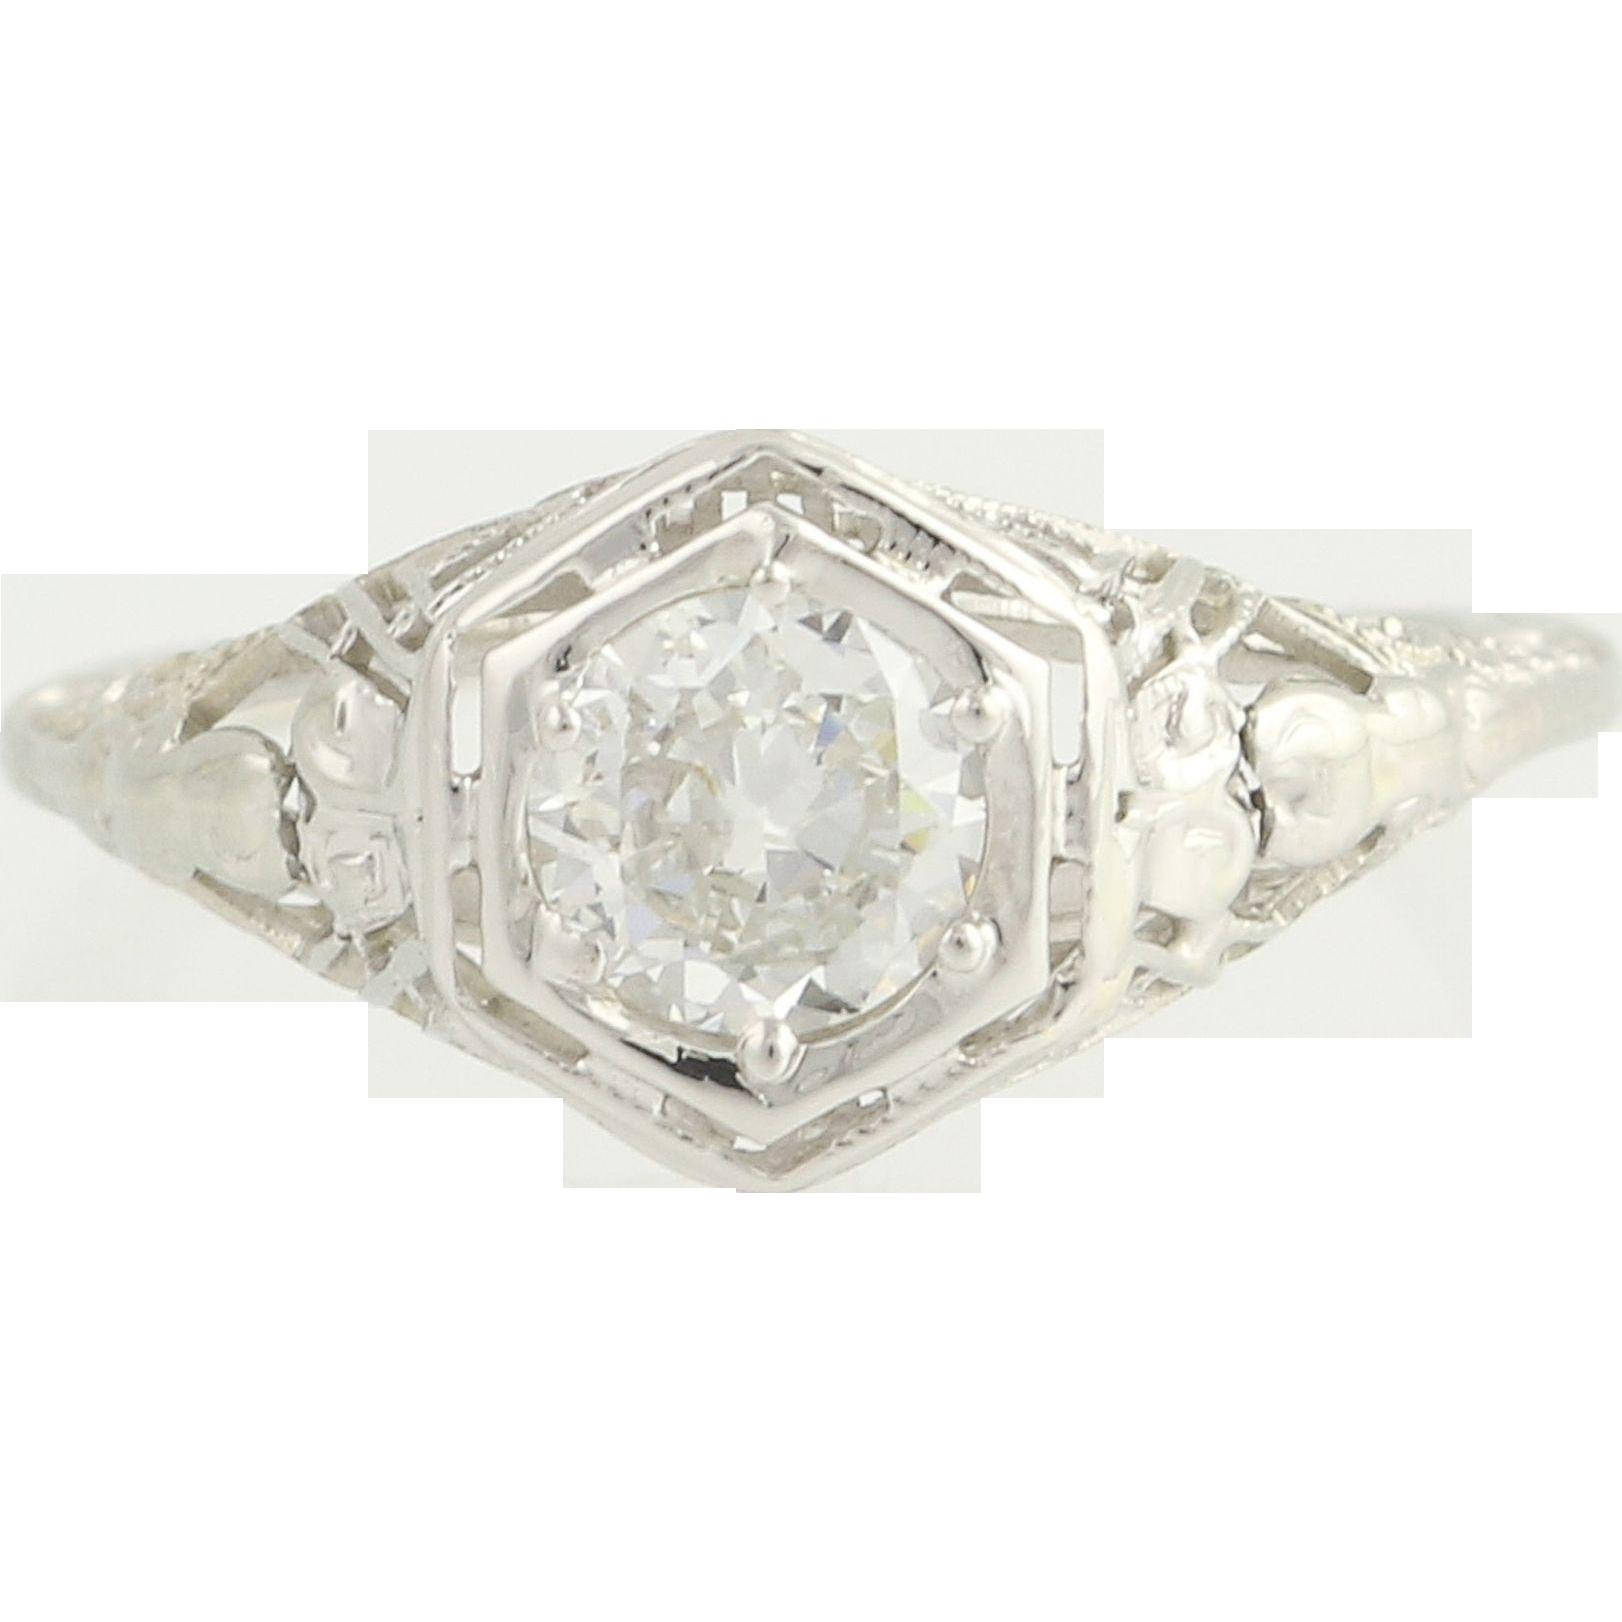 Art Deco Diamond Engagement Ring - 18k White Gold European Cut .60ct